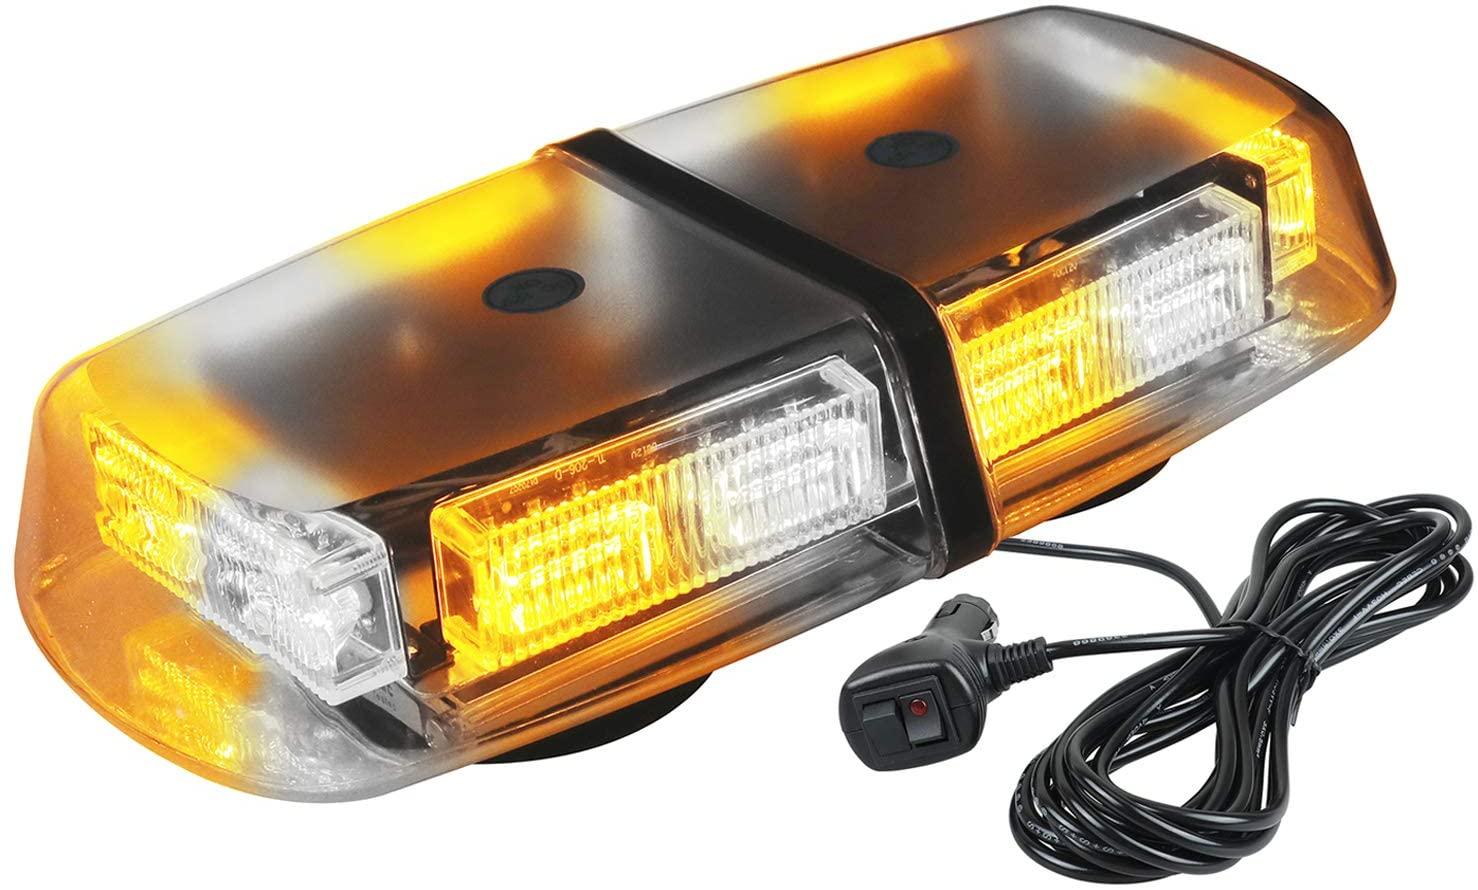 ASPL 36LED 12V High Intensity Law Enforcement Emergency Hazard Warning LED Mini Bar Strobe Light with Magnetic Base for Snow Plow, Trucks, Construction Vehicles (Amber/White)